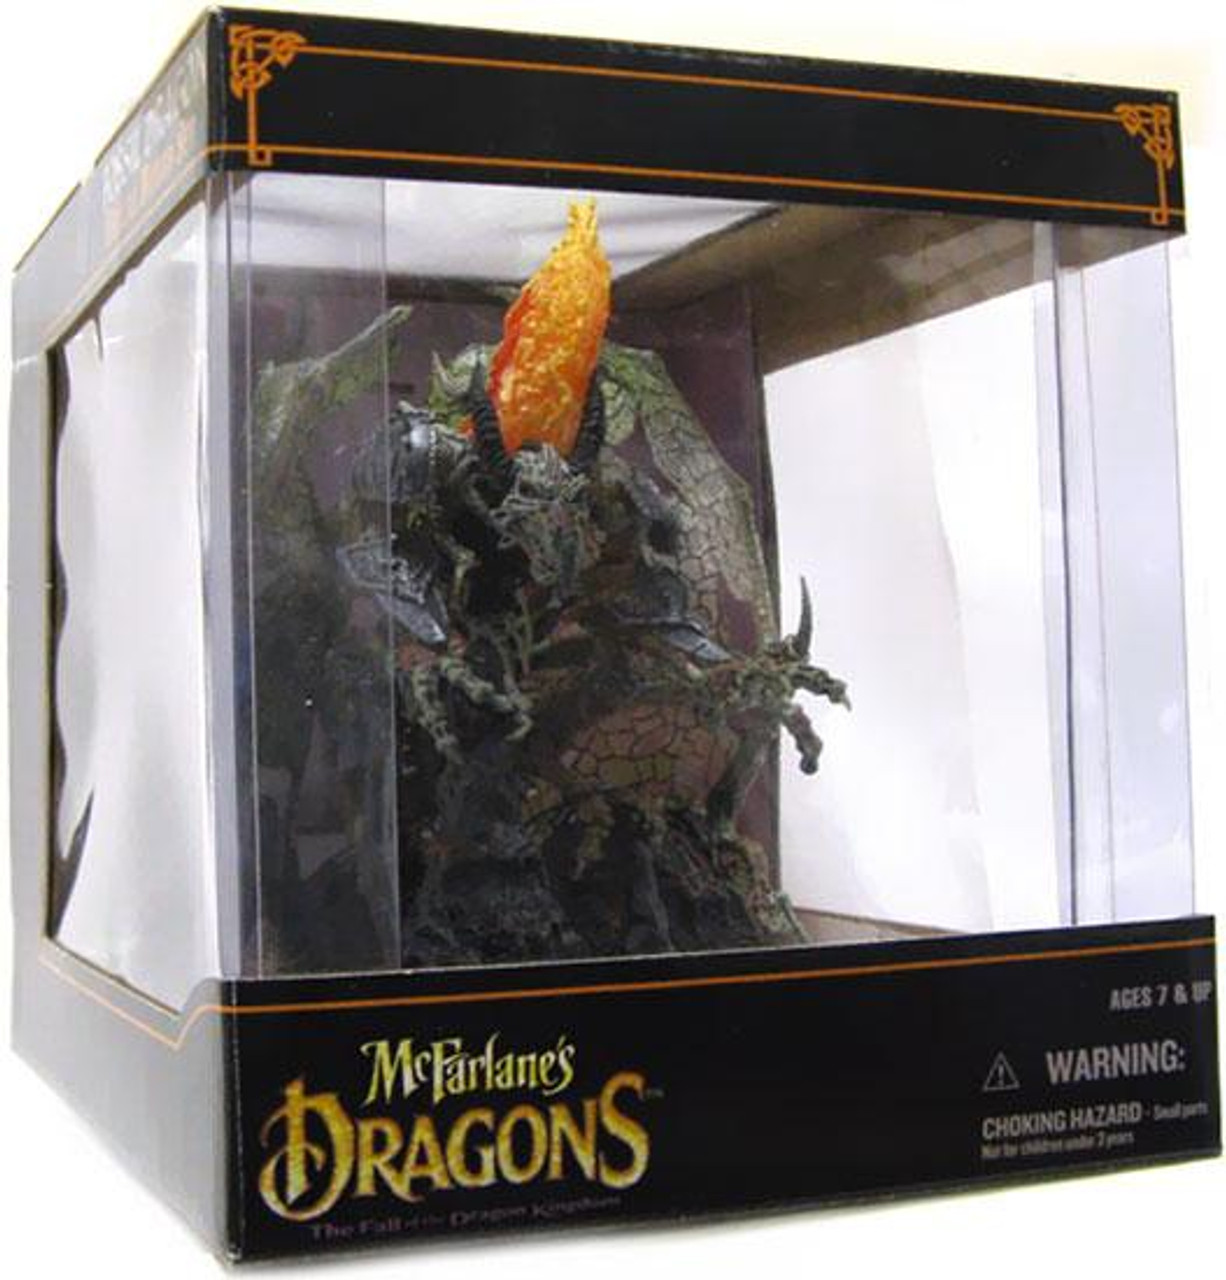 McFarlane Toys Dragons Series 6 Fossil Dragon Clan Action Figure